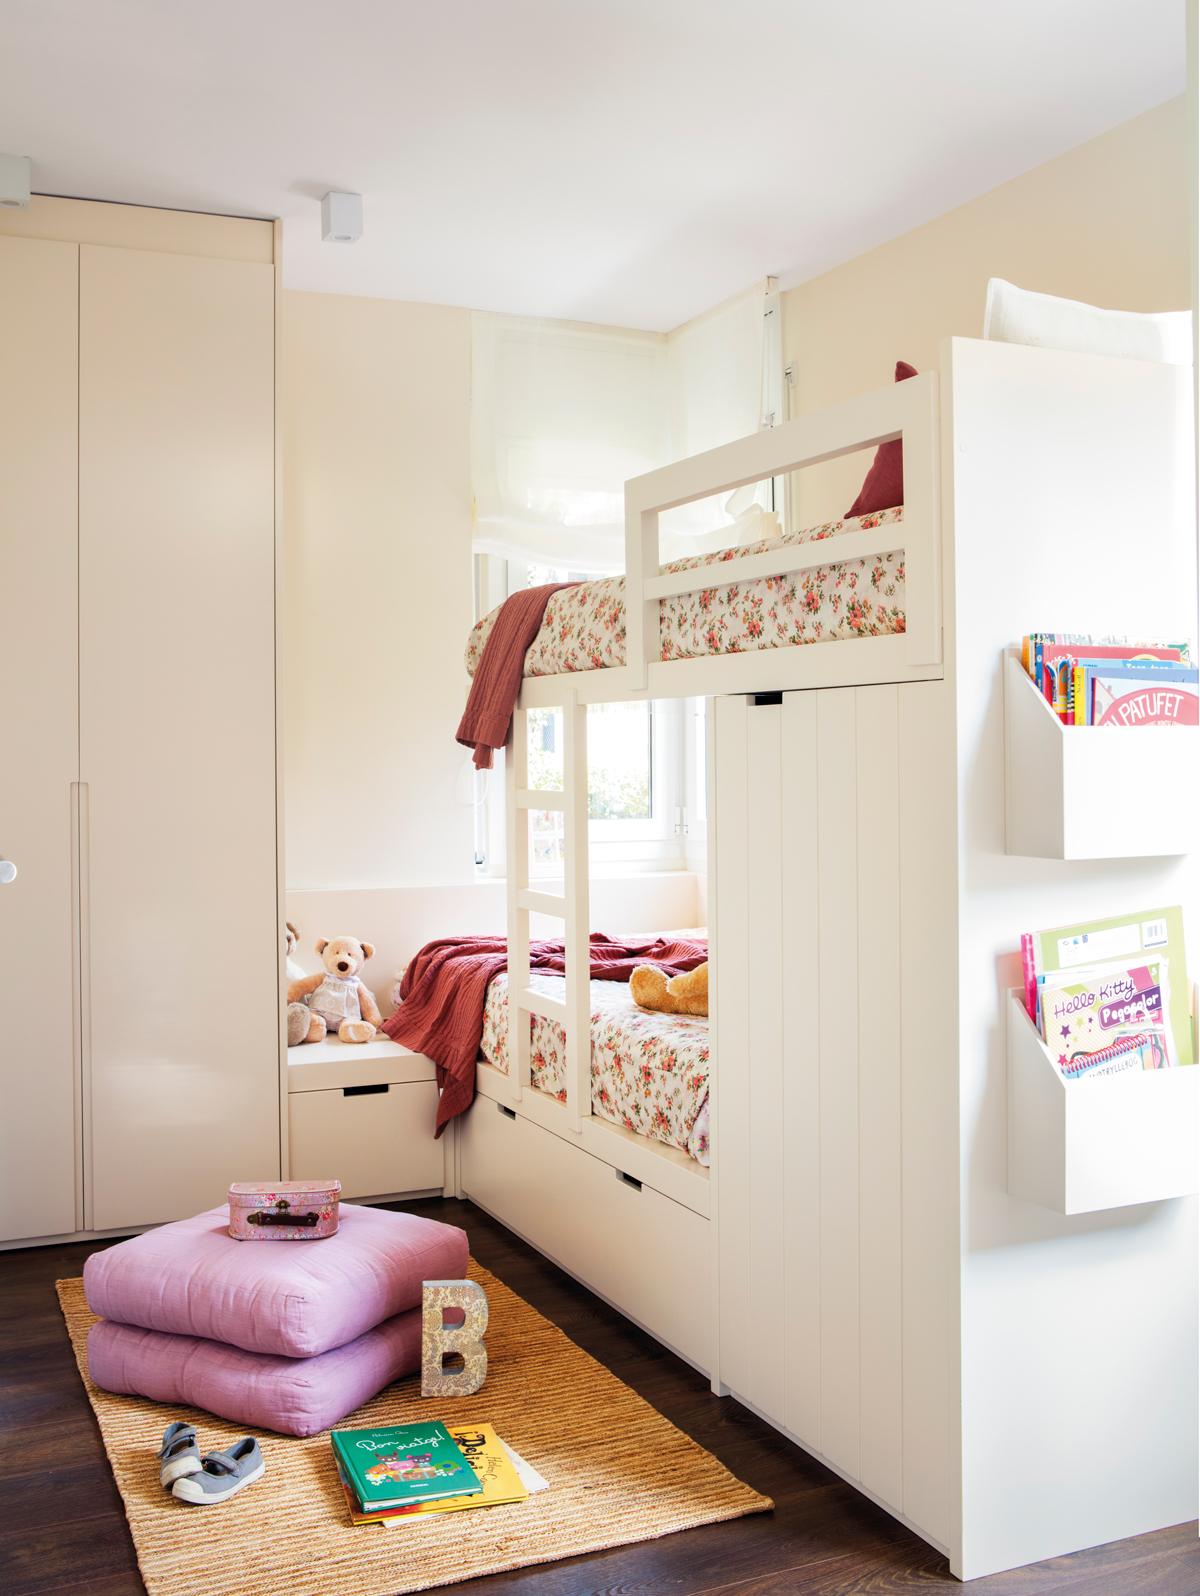 Soluciones para cuartos de ni os peque os - Dormitorio infantil segunda mano ...